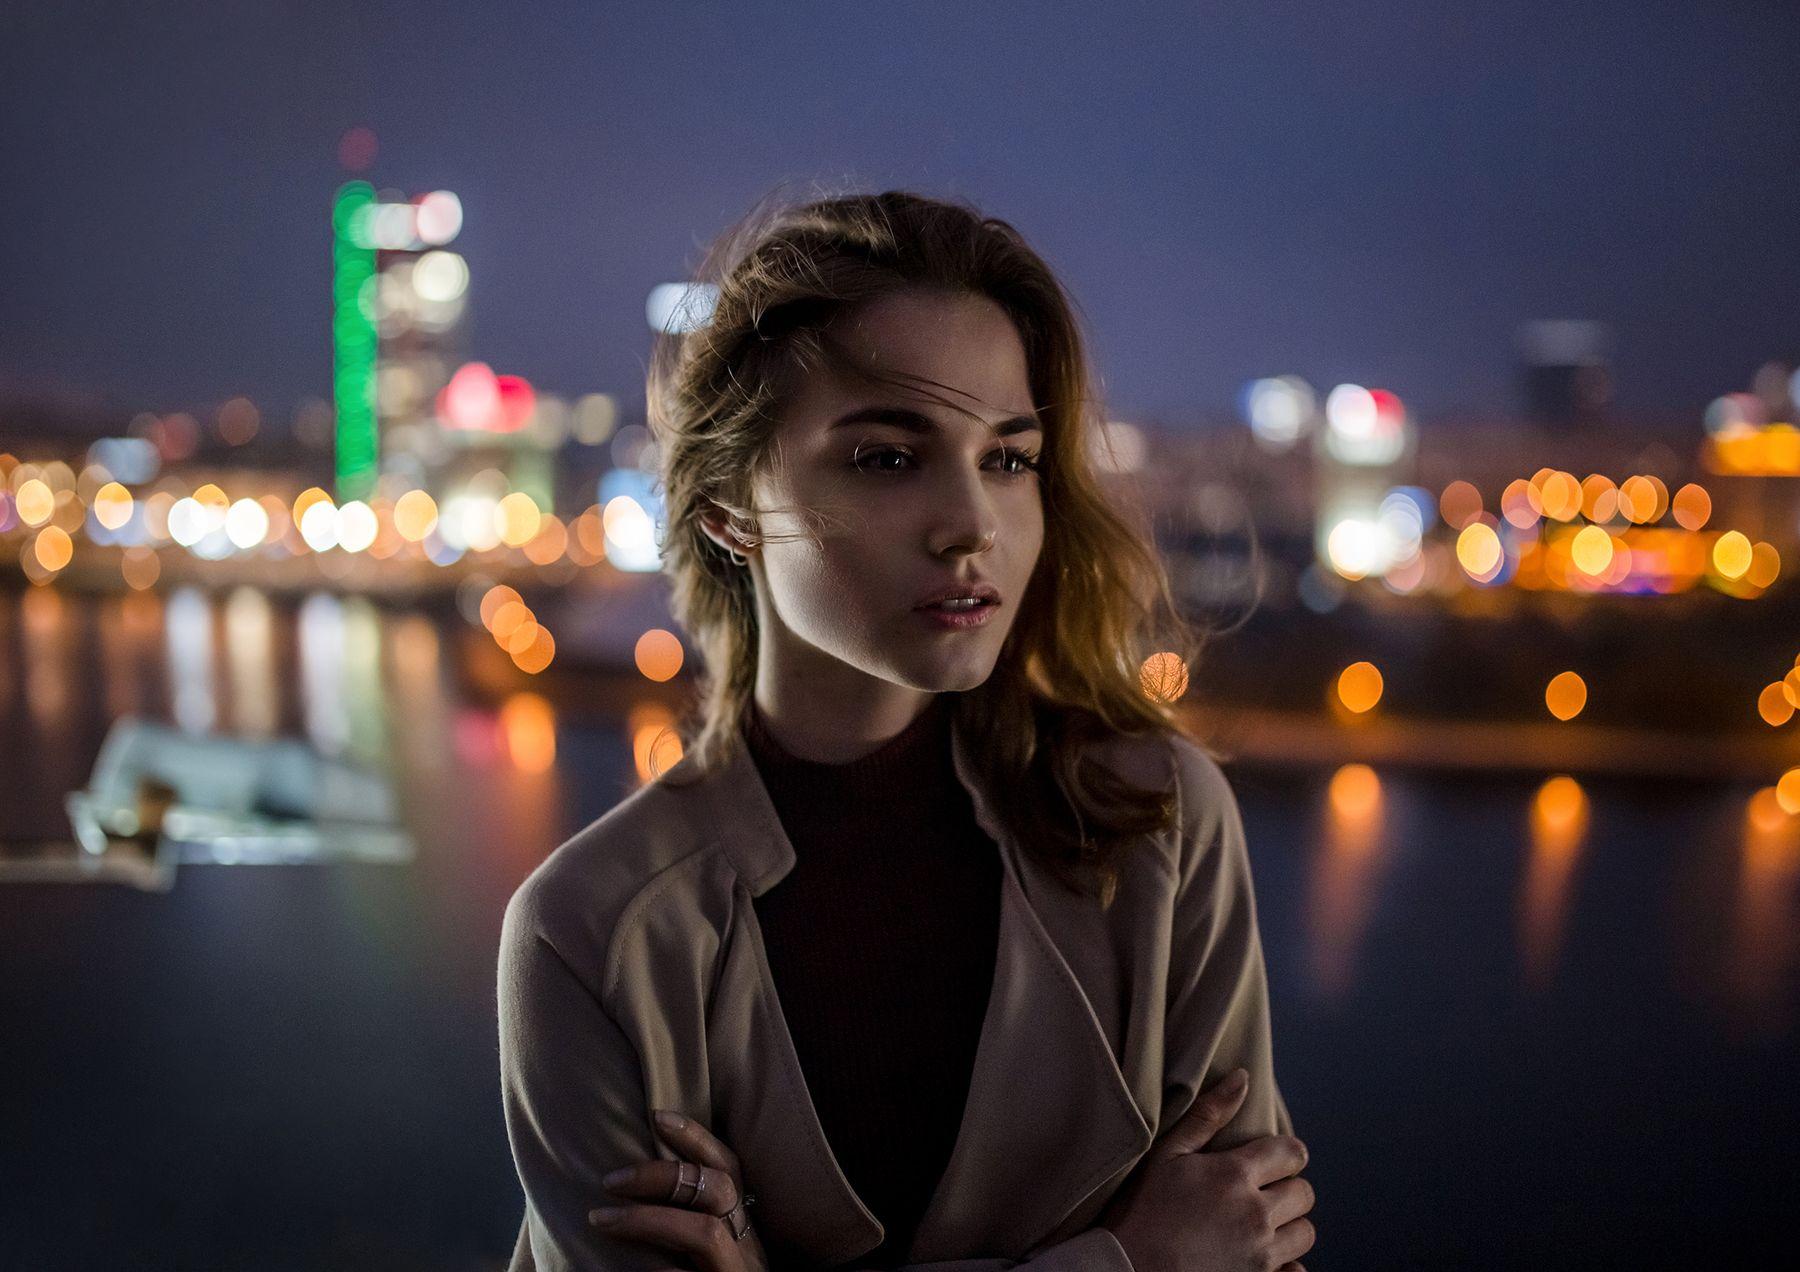 Ананда Девушка портрет улица город ночь